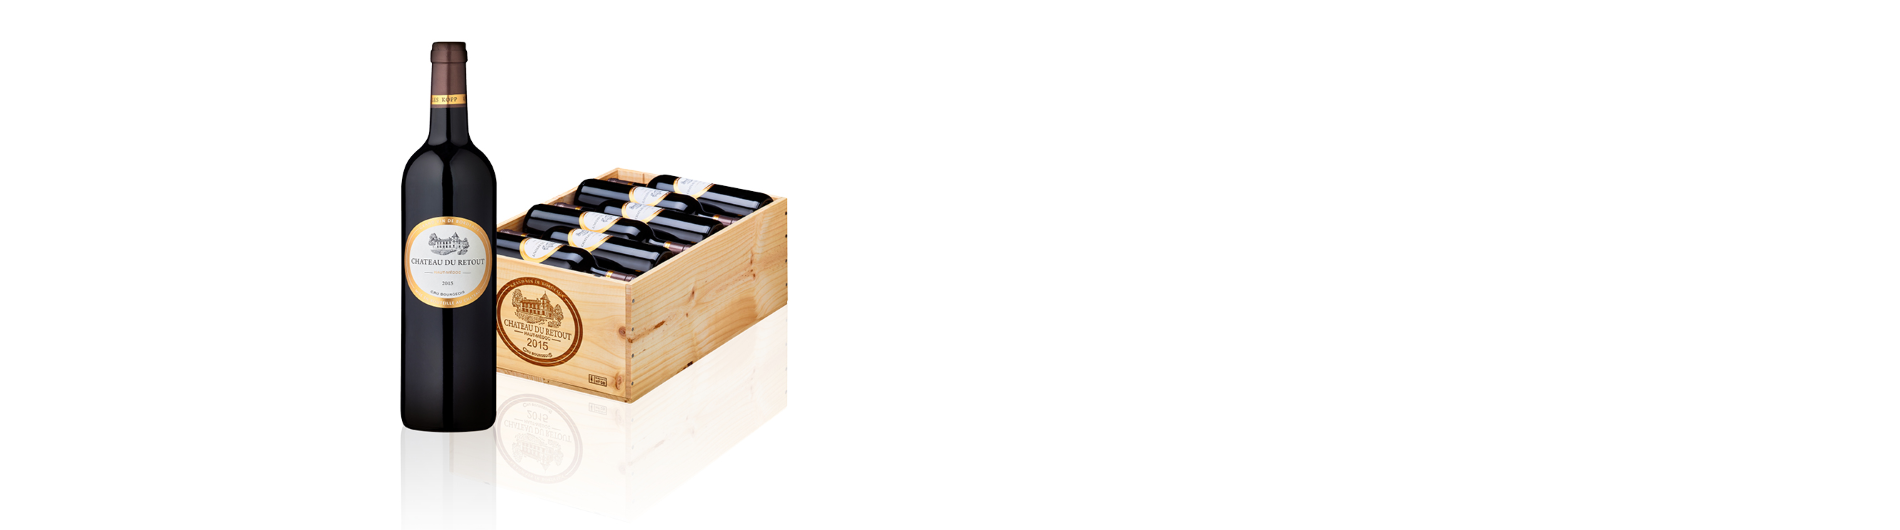 WESER-KURIER Wein-Edition: Festtagswein 2018